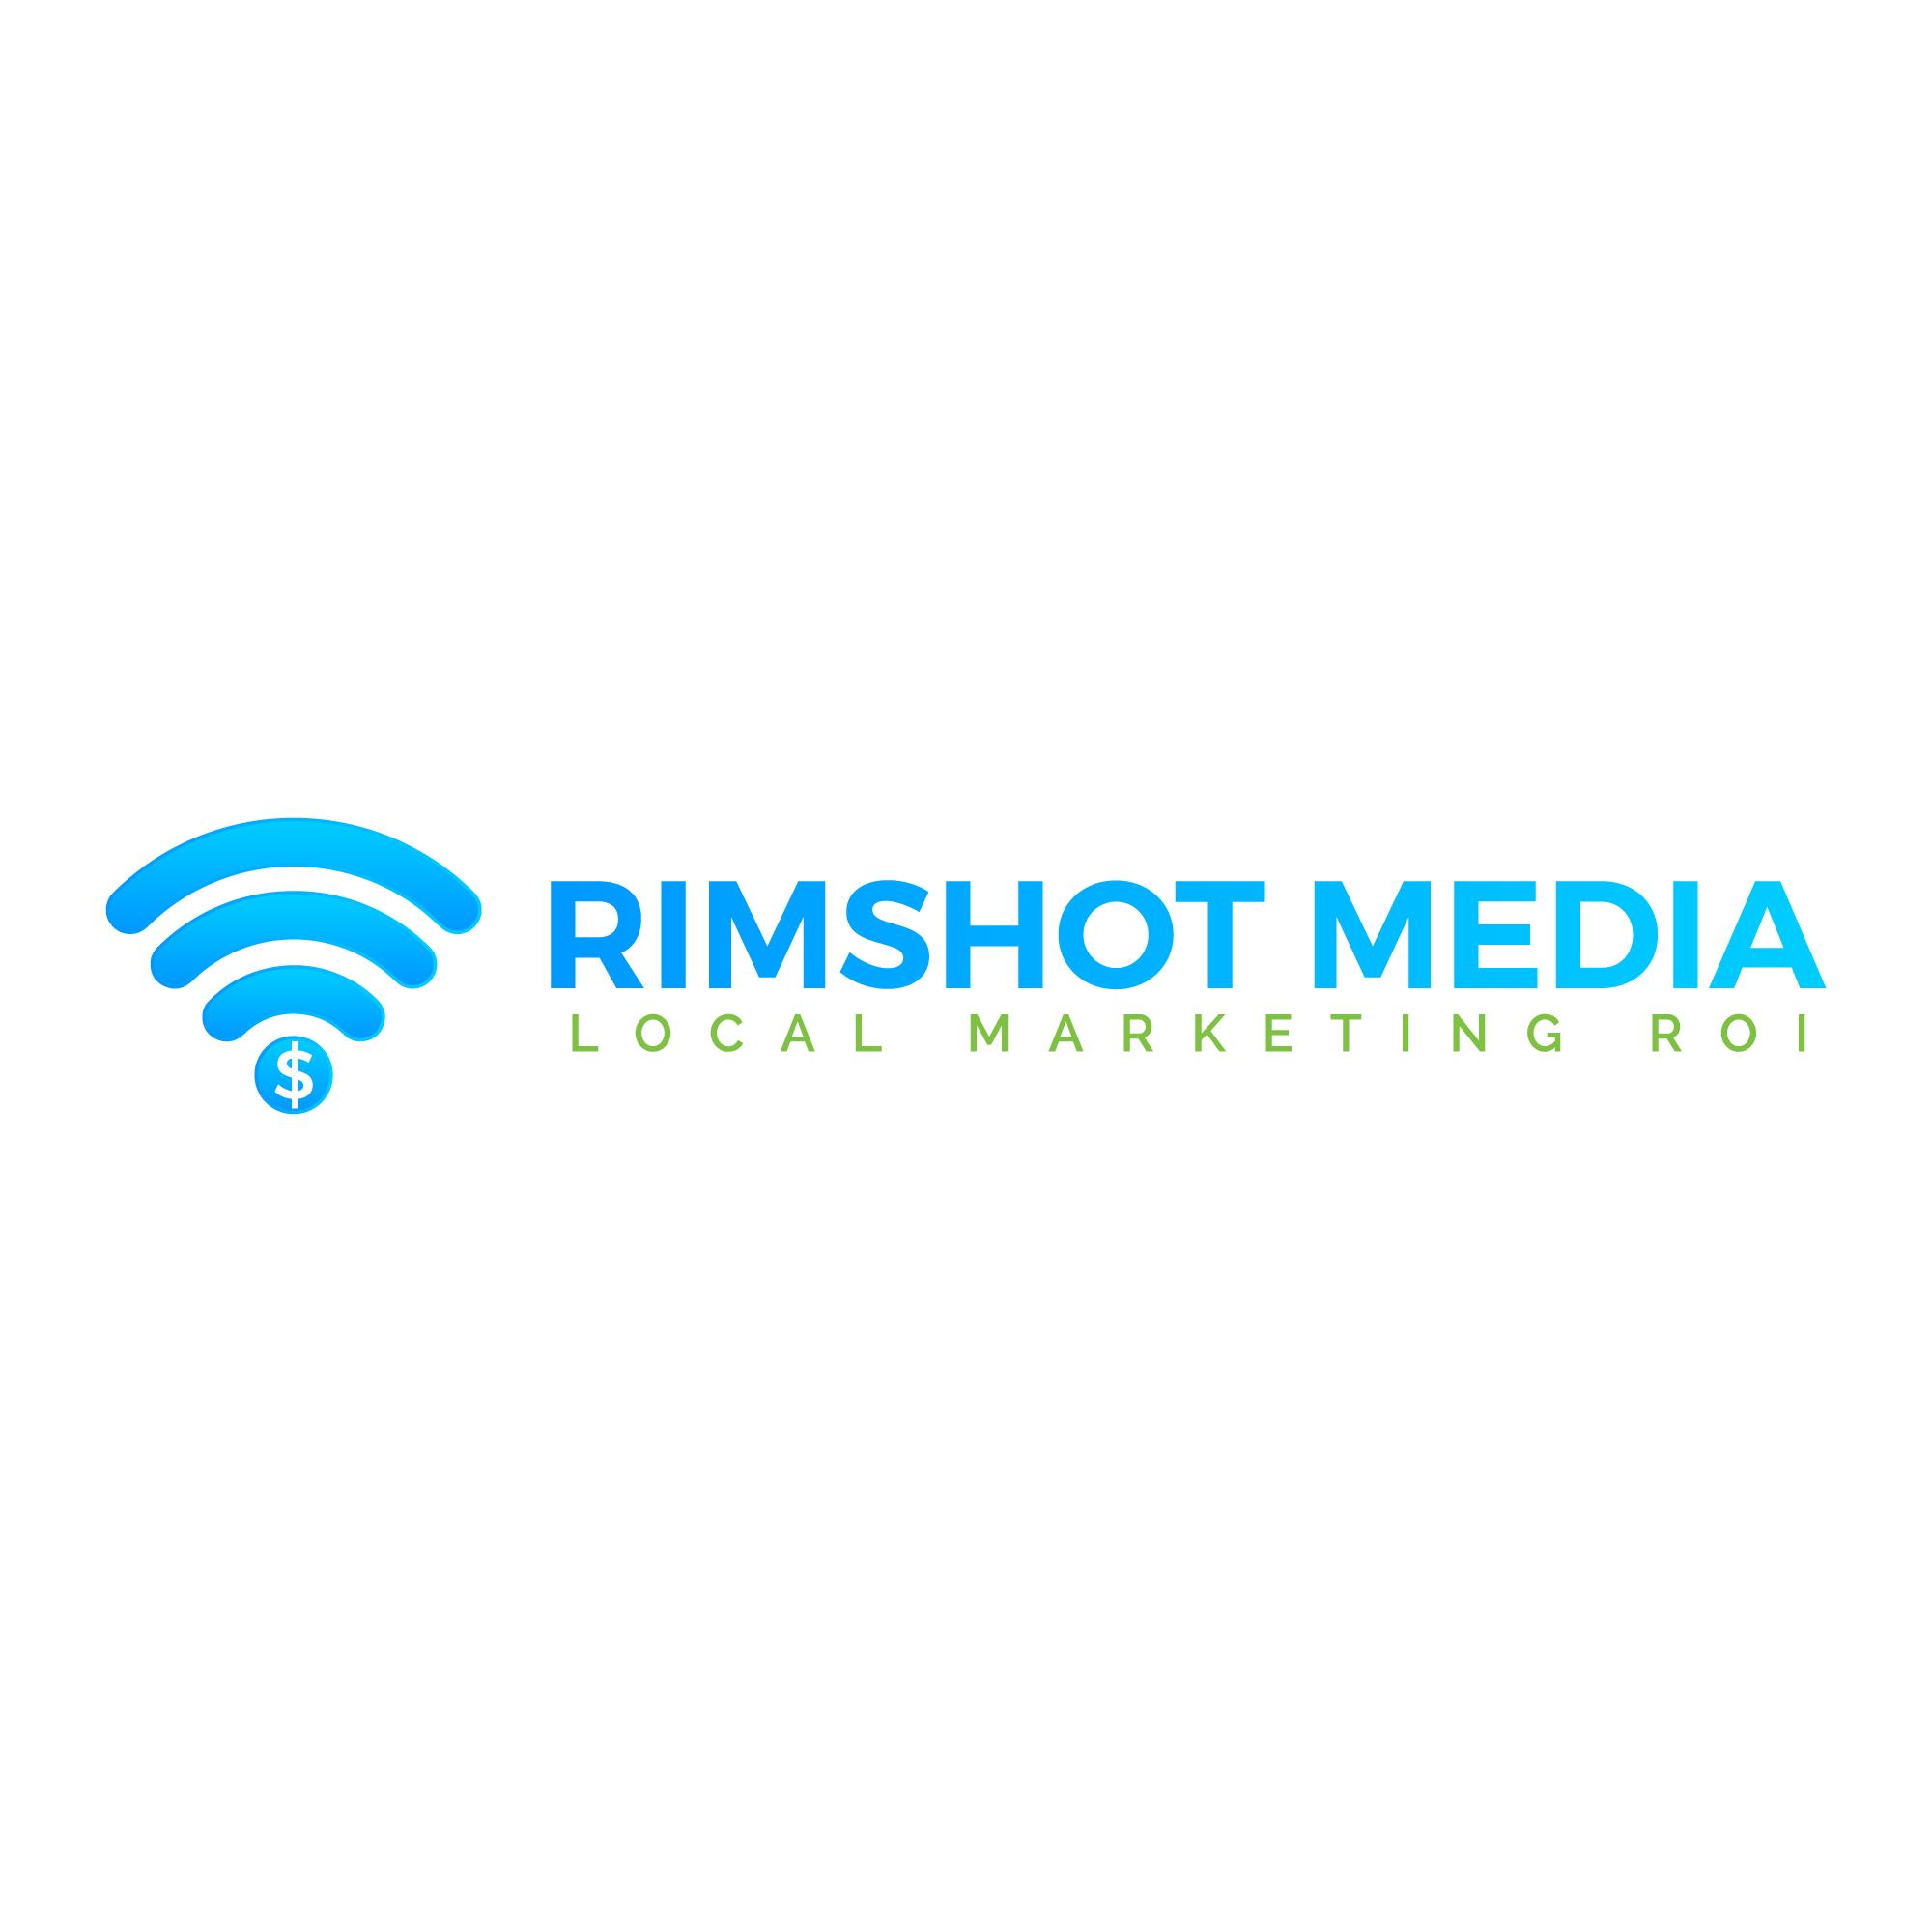 Rimshot-Media-Logo-A